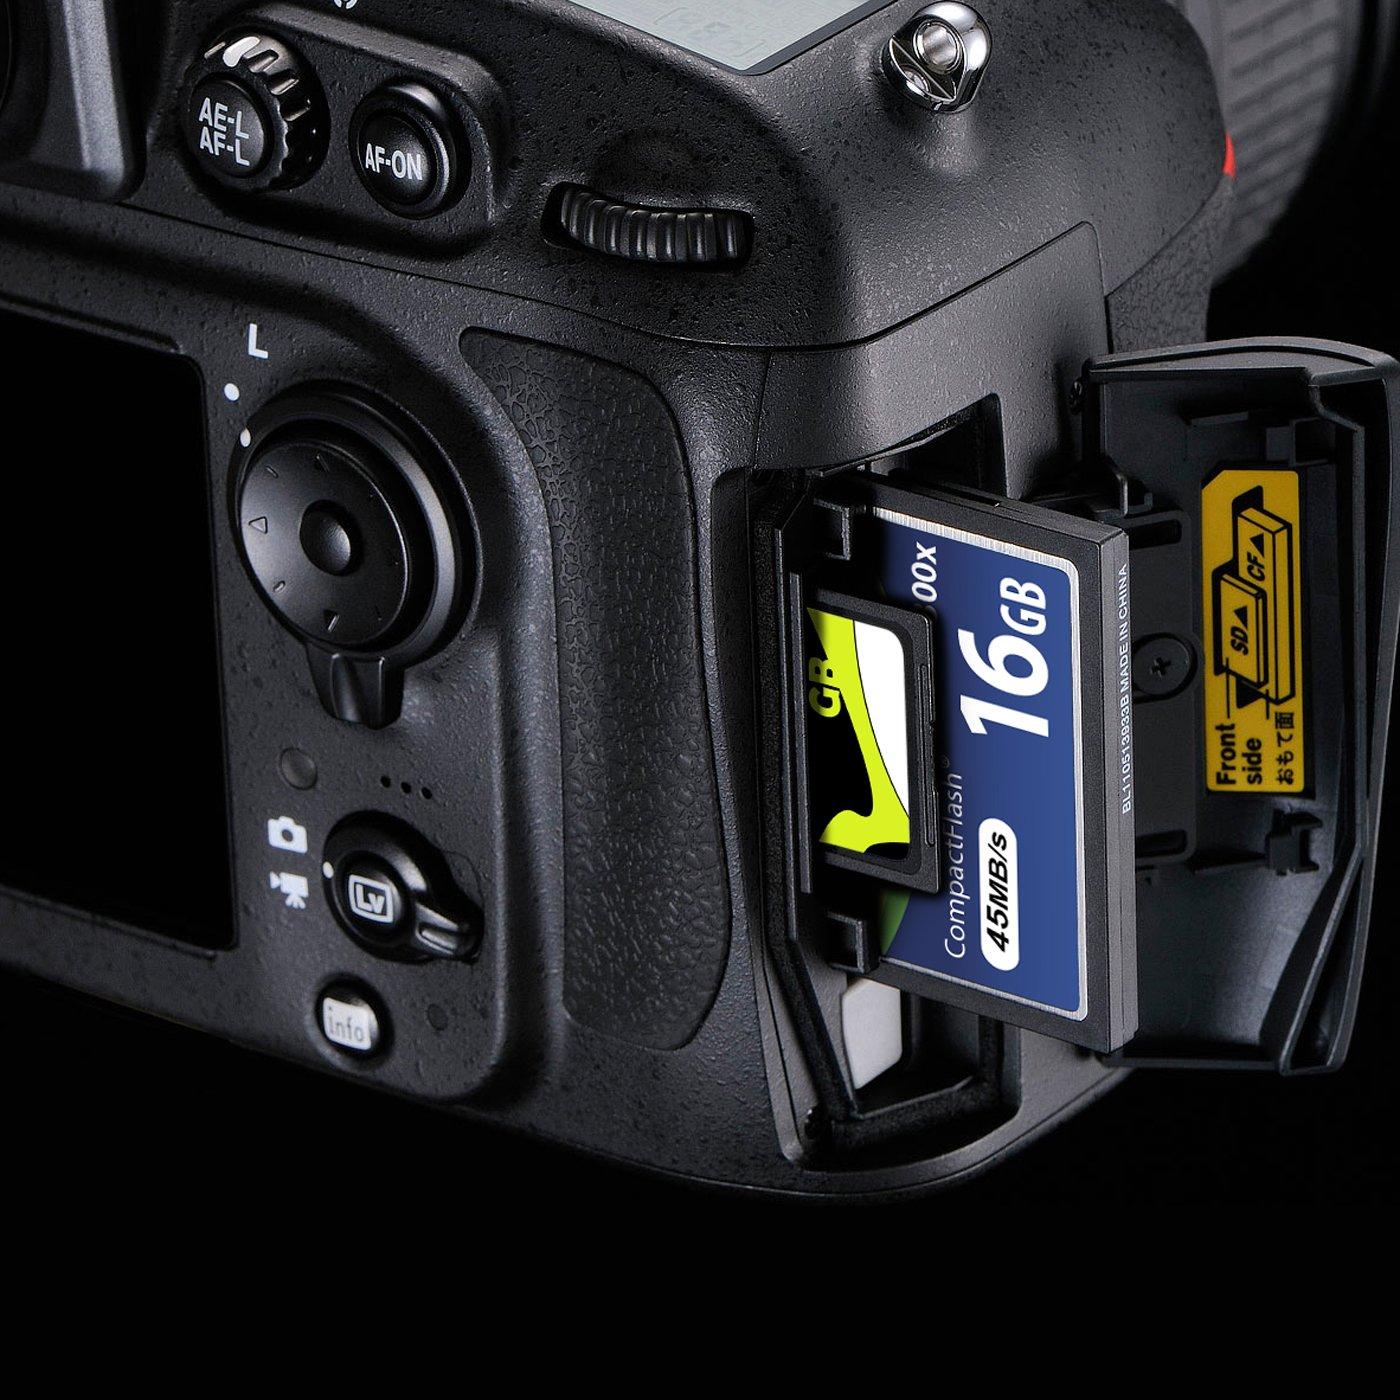 NEW 16GB HIGH SPEED 300x 45MB//s CF Compact Flash MEMORY CARD FOR Konica Minolta e-mini M Konica Minolta Maxxum 5D Konica Minolta Maxxum 7D Konica Minolta RD-3000 SLR DIGITAL CAMERA UK